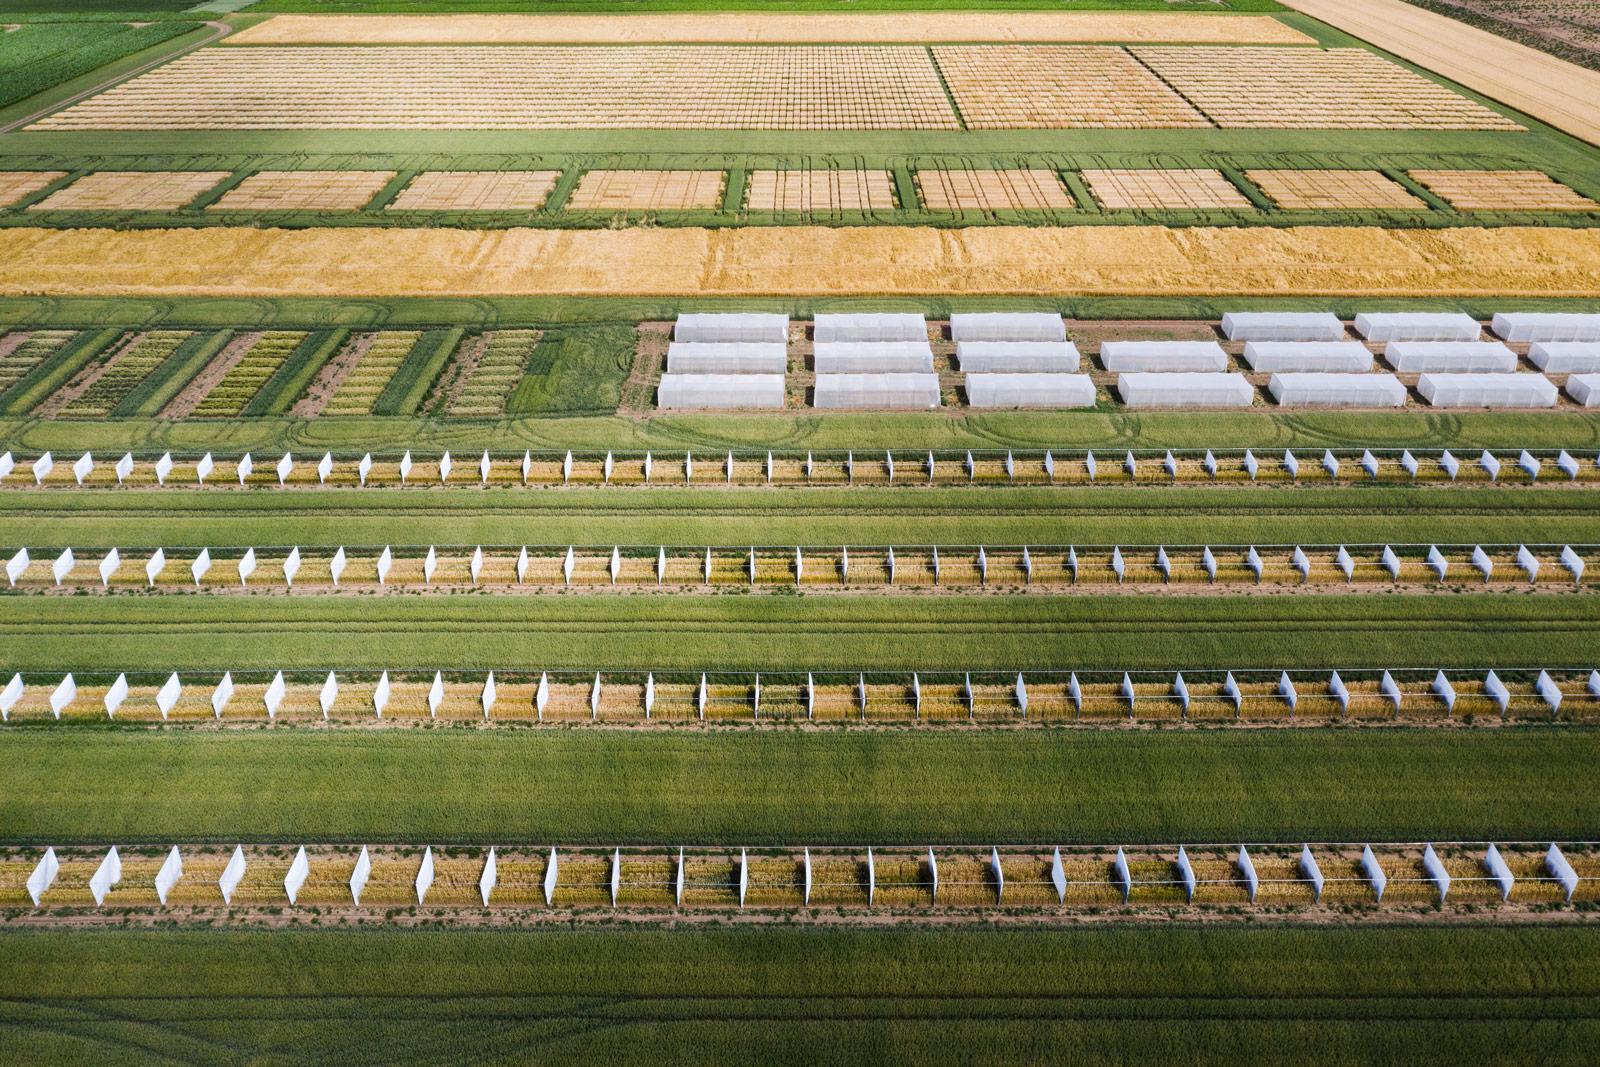 Genverändertes Saatgut, Deutschland © Kollektiv25